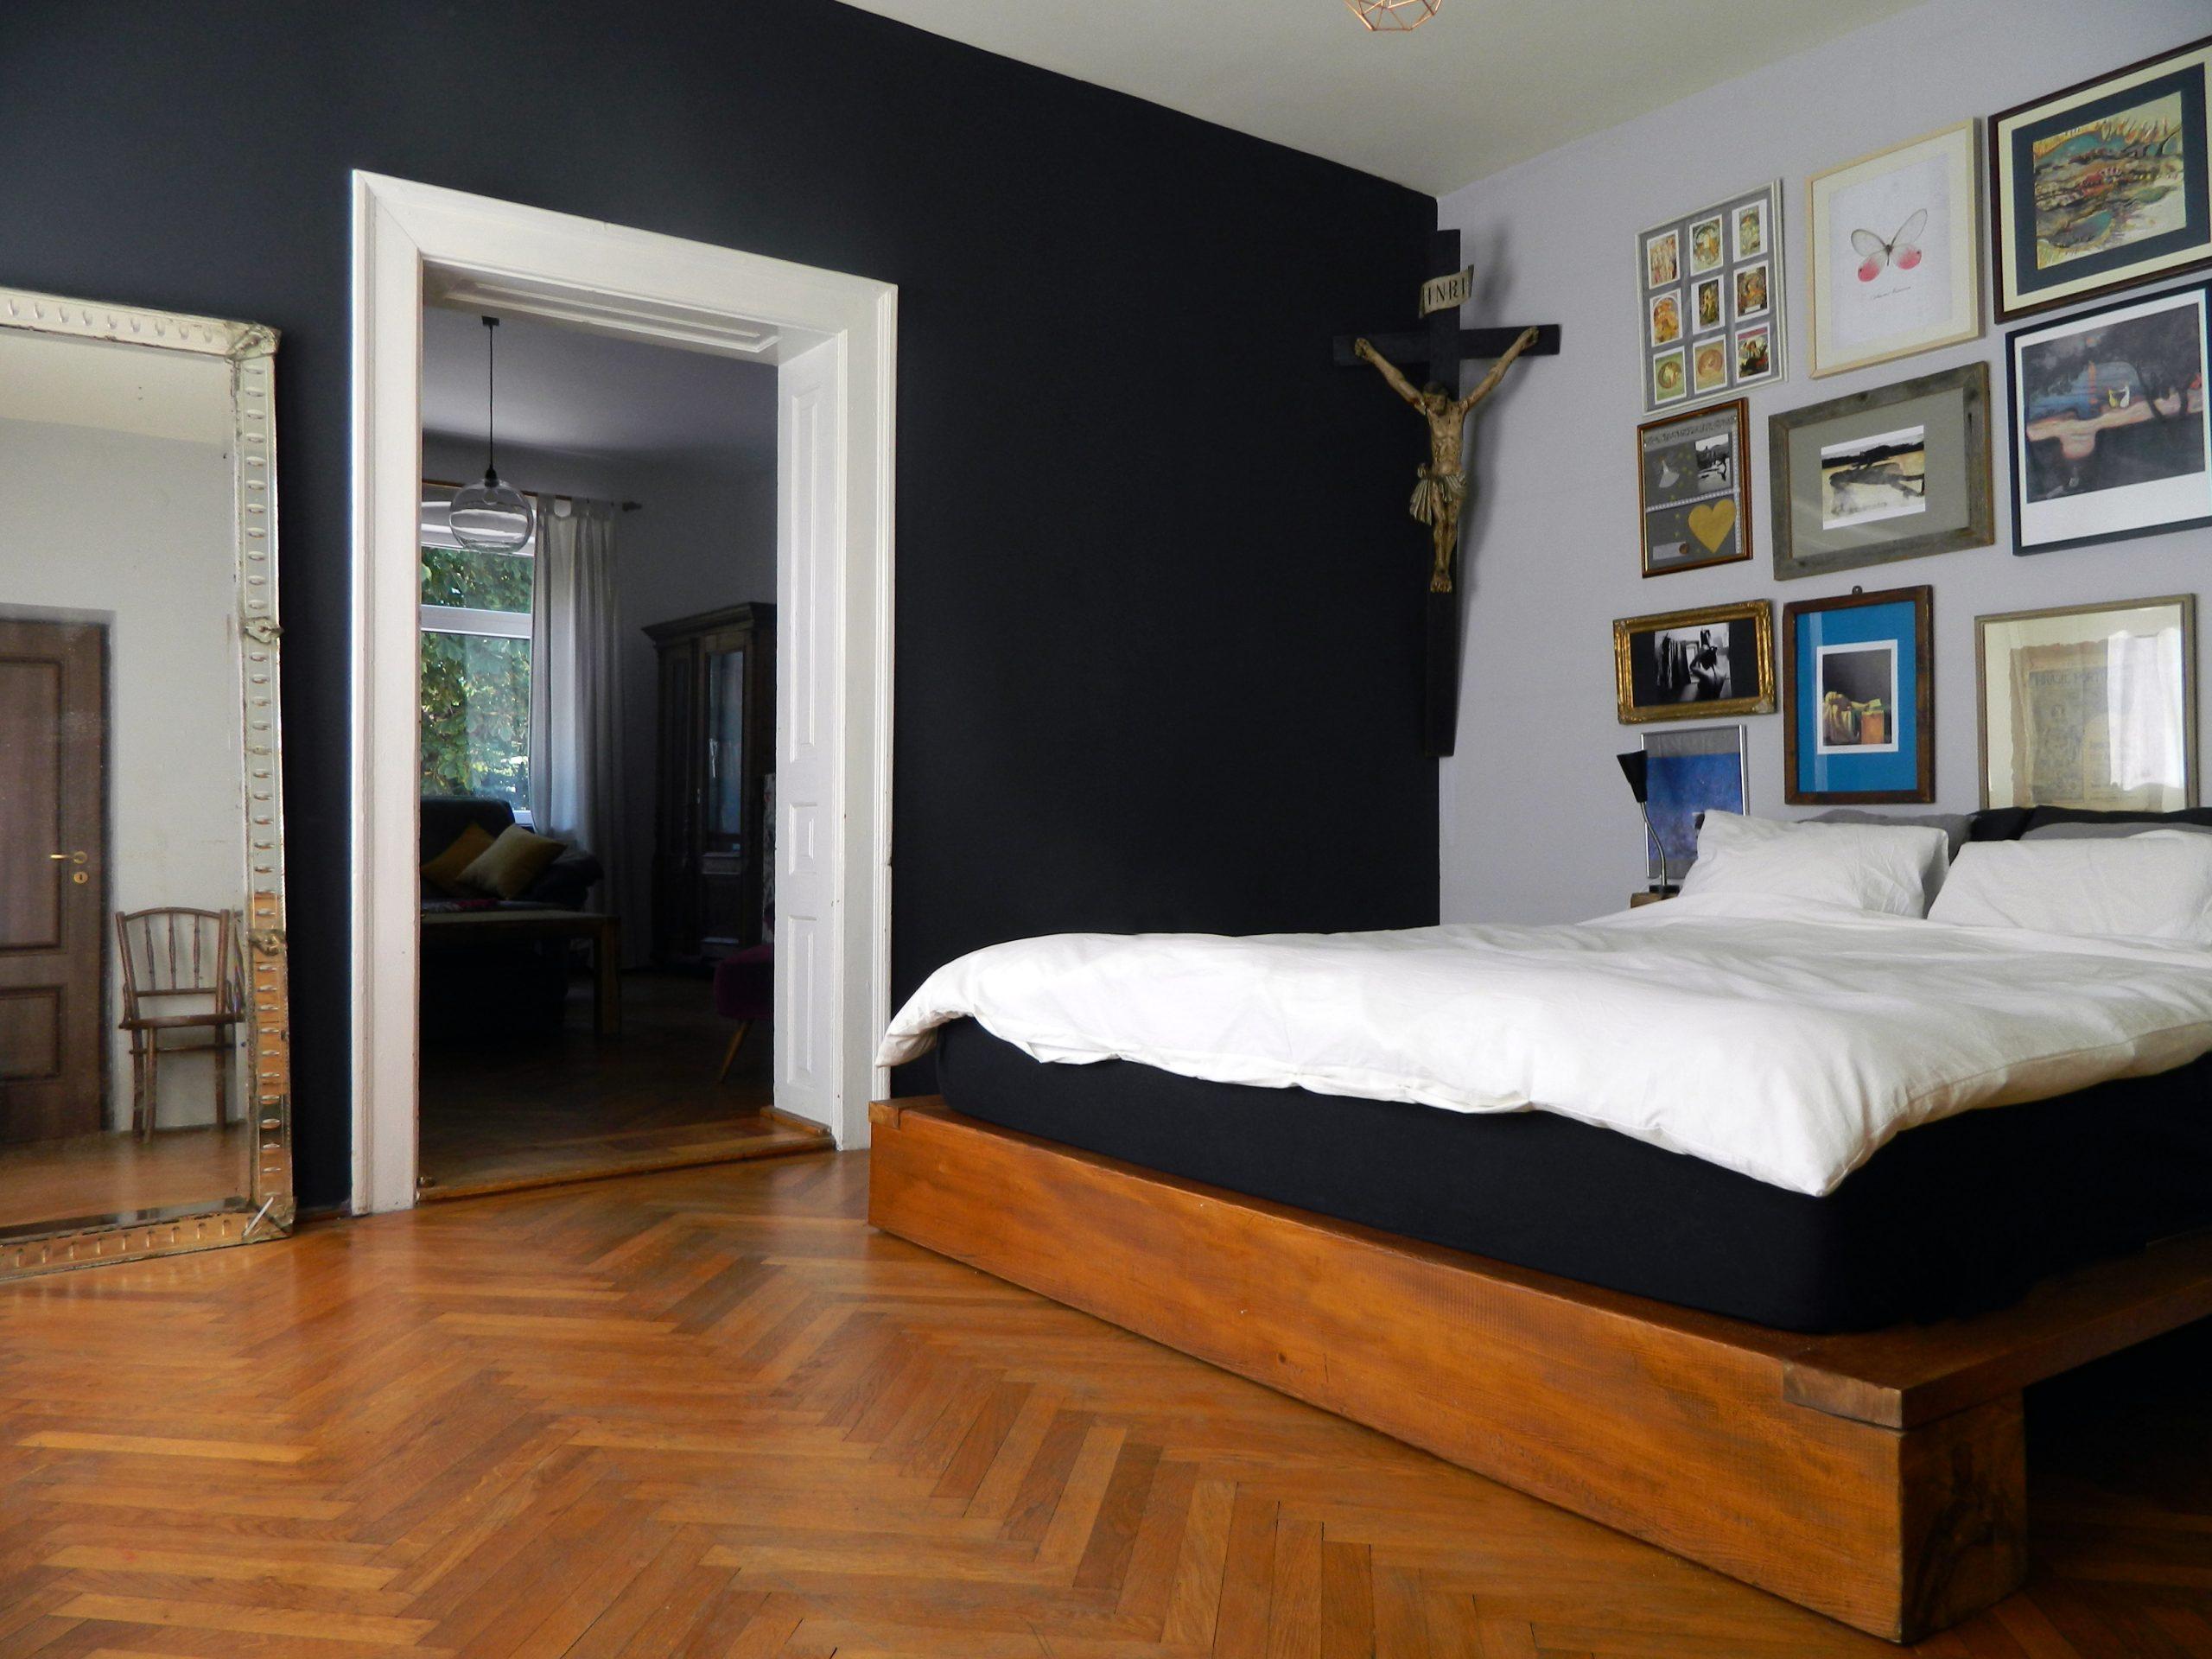 perete negru in dormitor casa adela chivarean